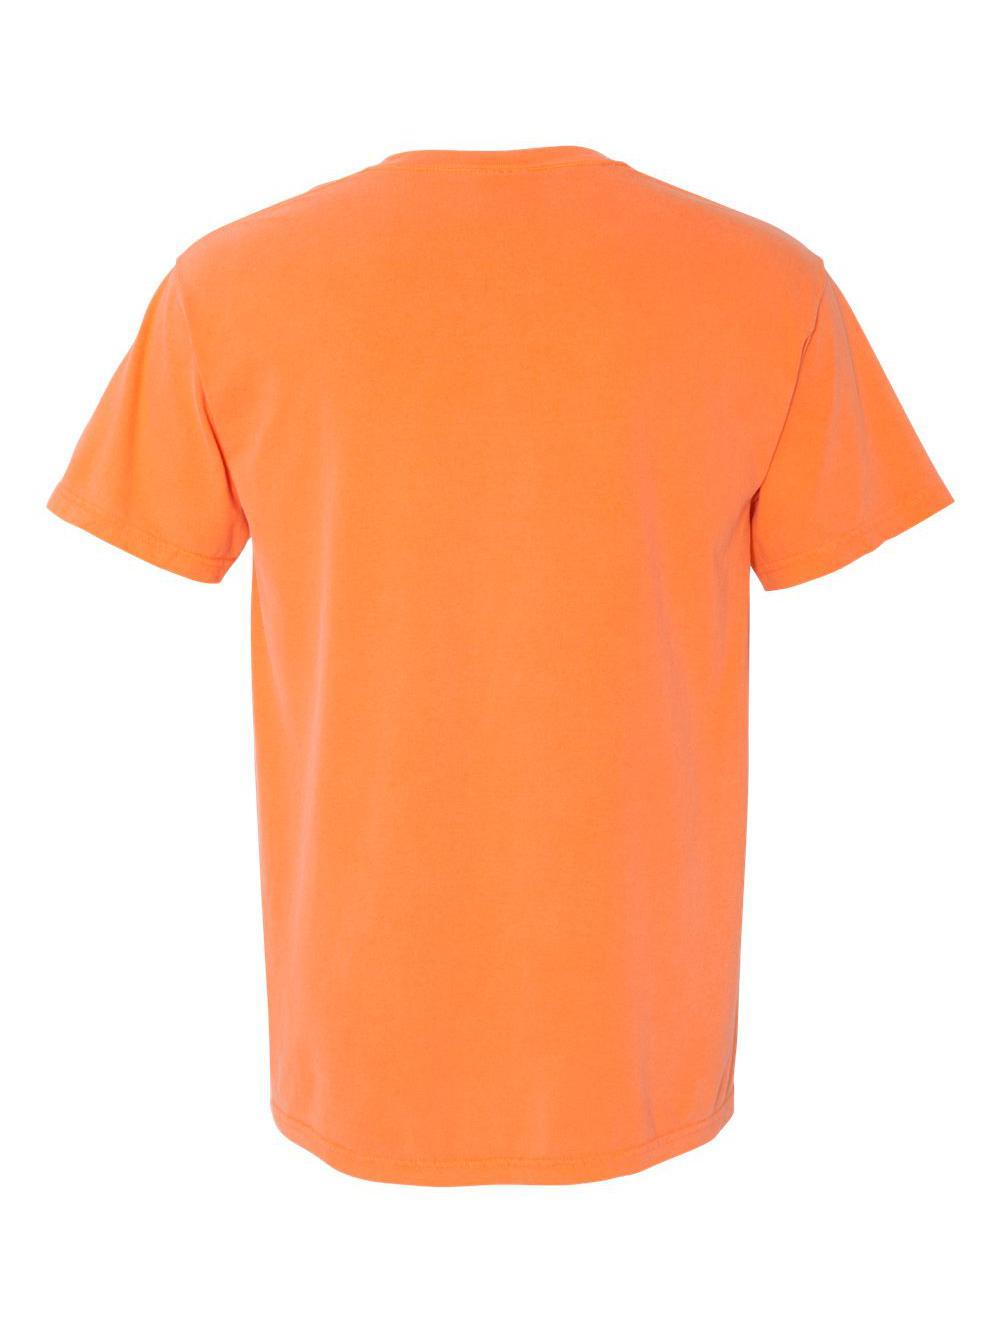 Comfort-Colors-Garment-Dyed-Heavyweight-Ringspun-Short-Sleeve-Shirt-1717 thumbnail 85